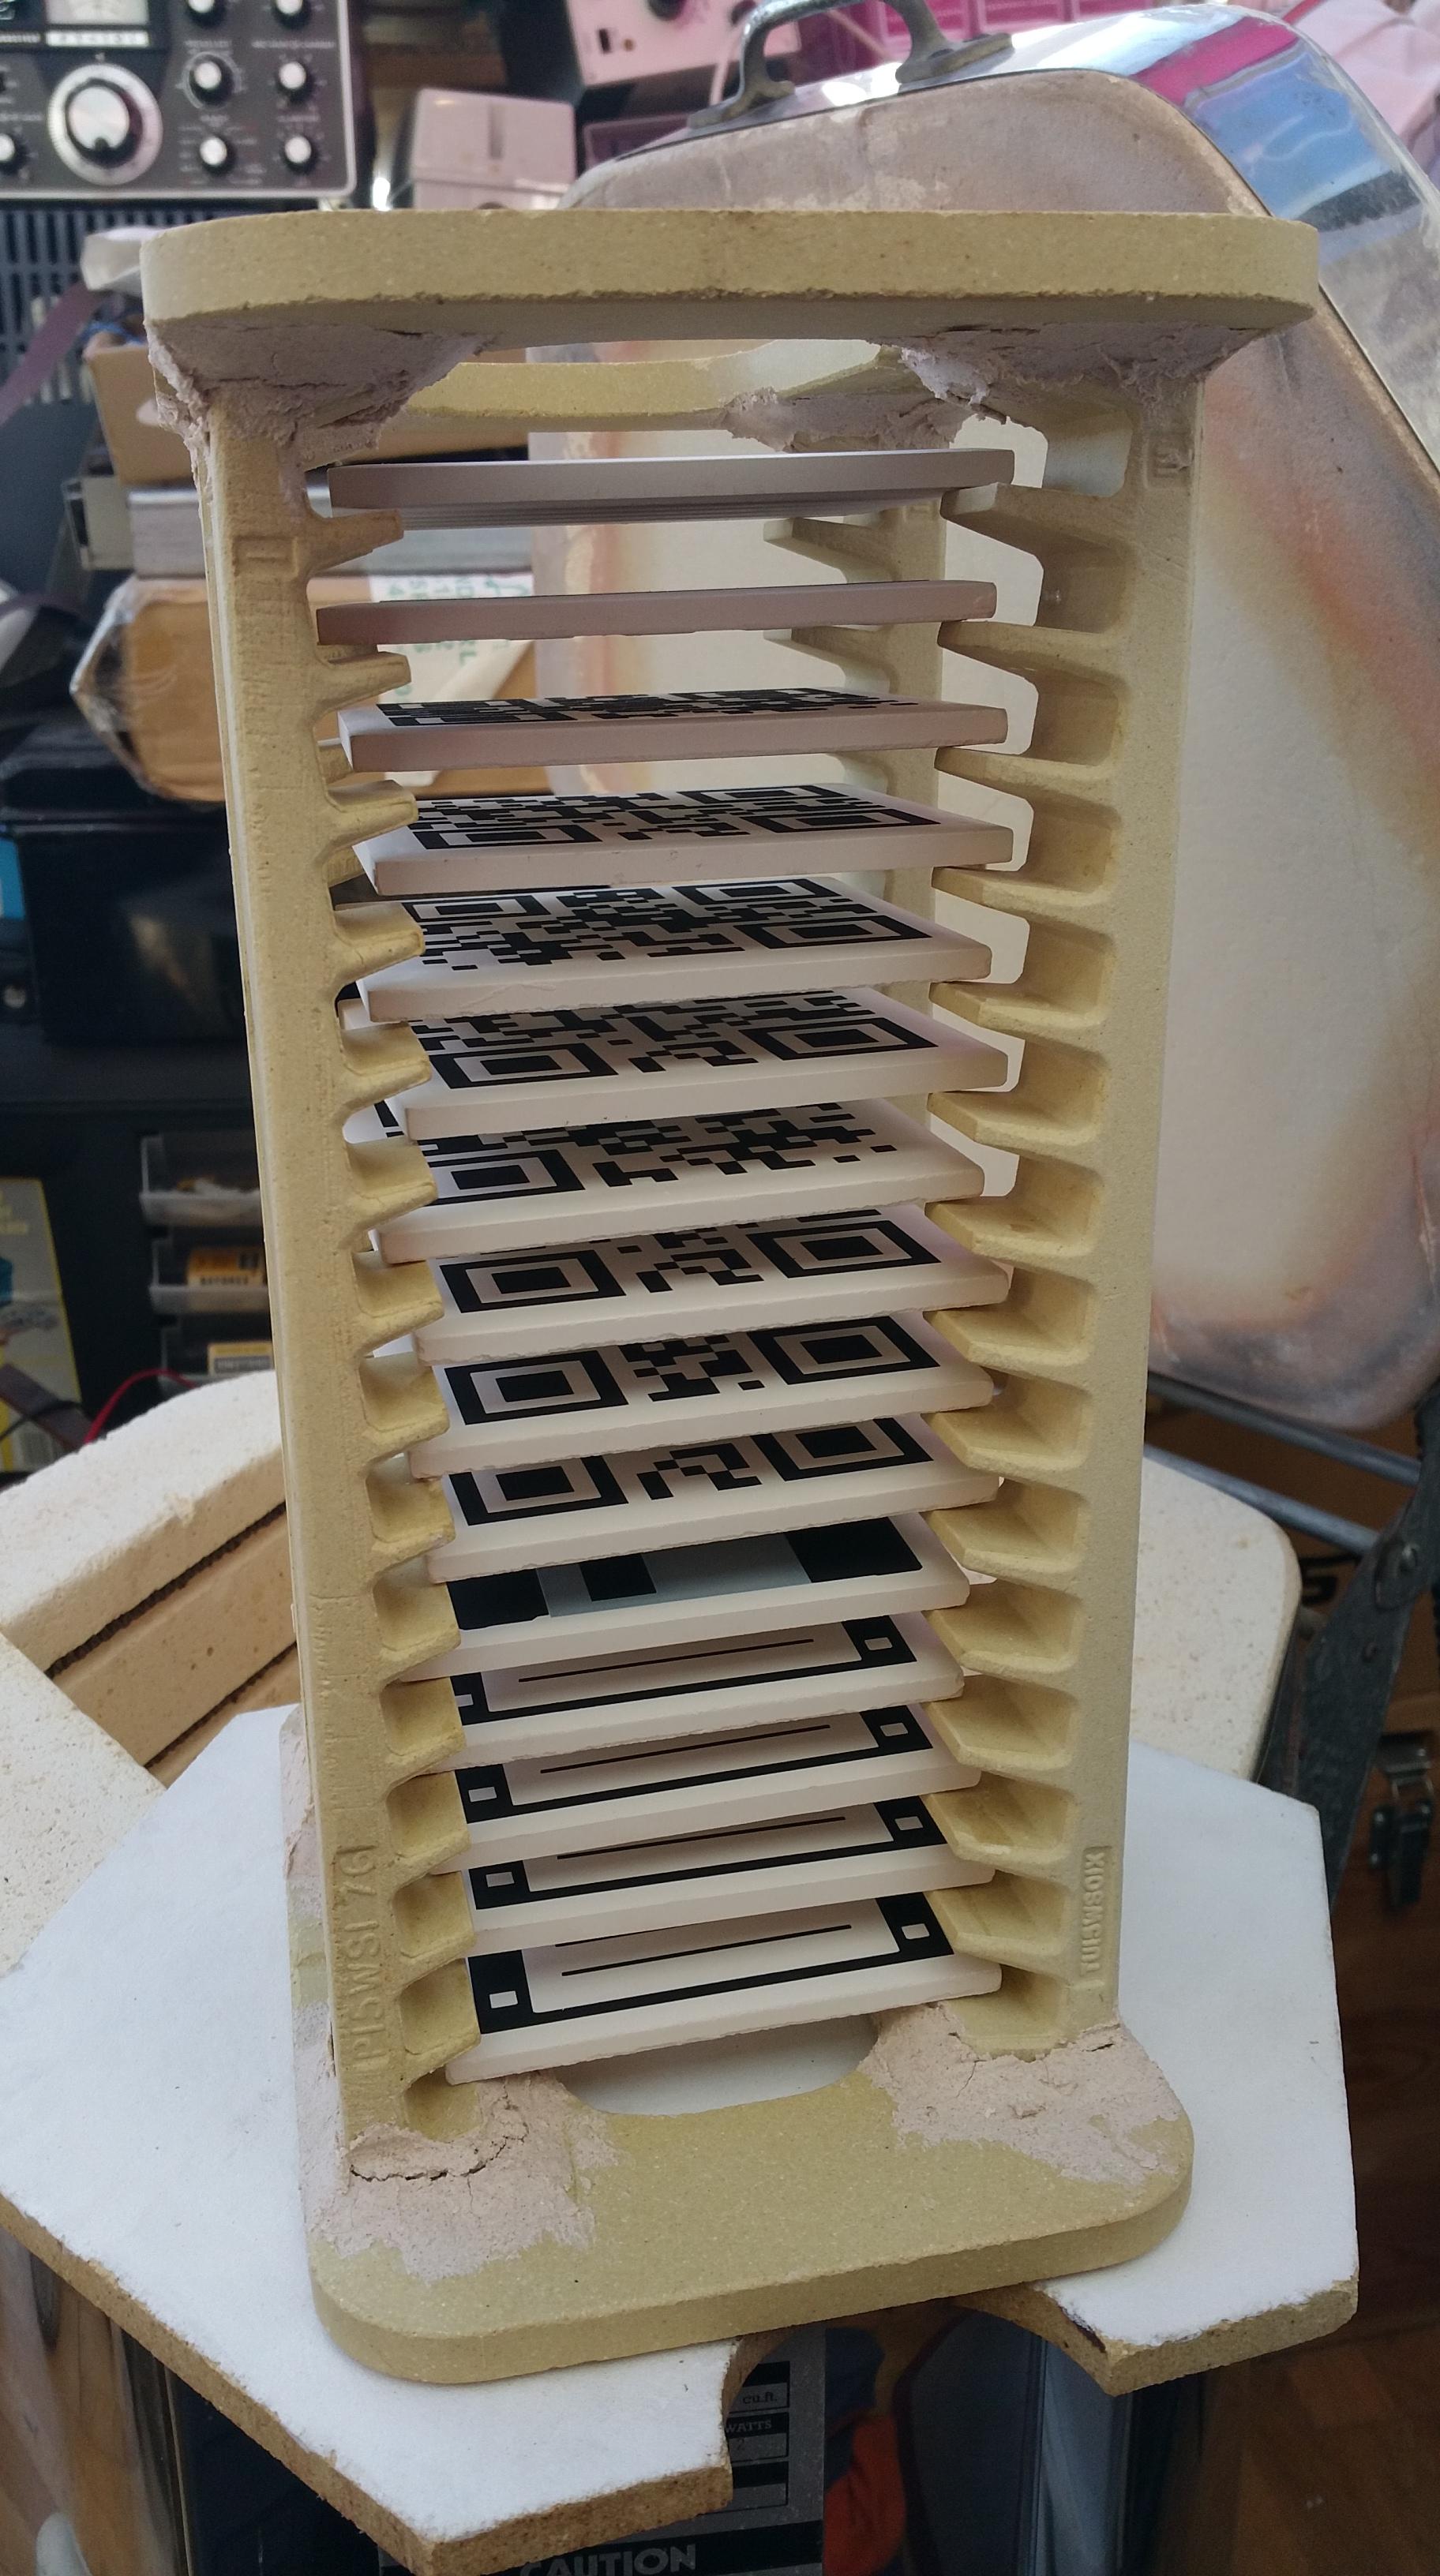 duncan kiln wiring diagram xlr to trs tiles peter black 39s art